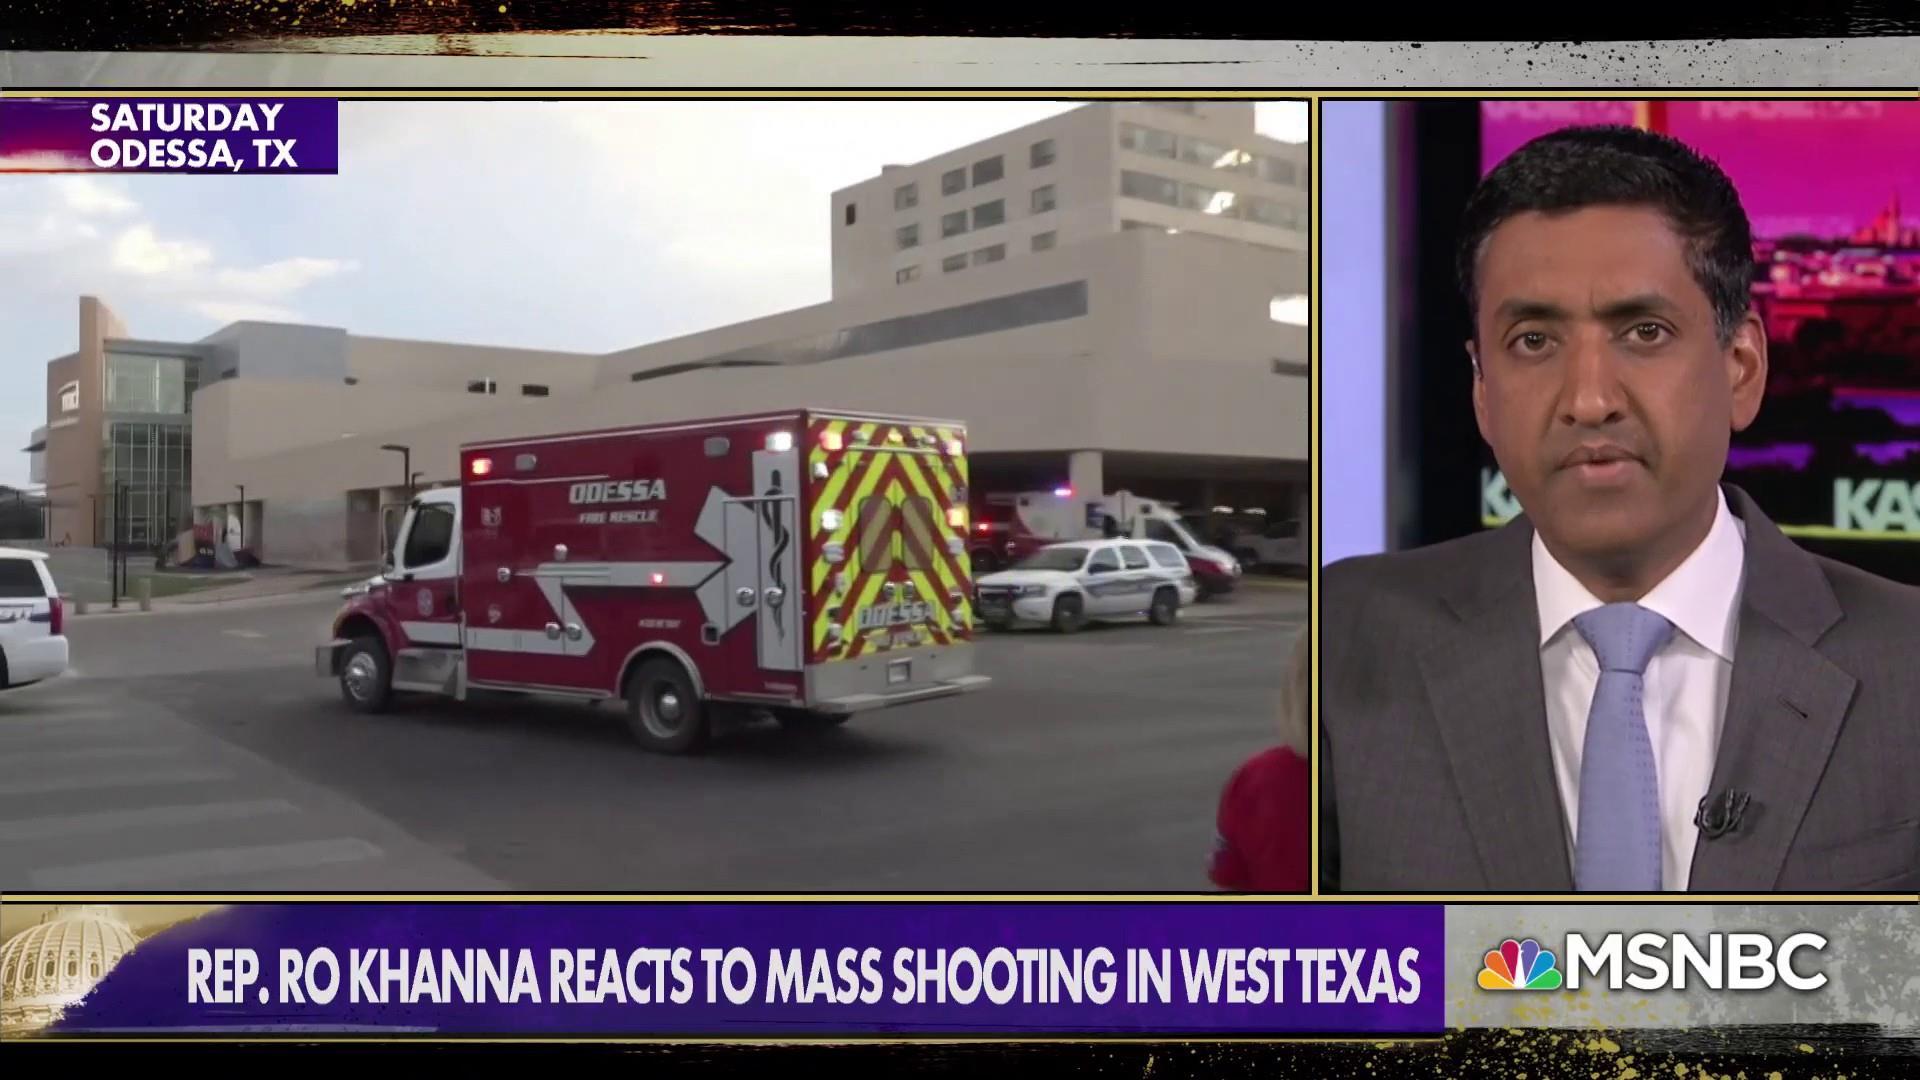 Rep. Ro Khanna on gun violence: 'Speaker Pelosi should call back the Congress tomorrow'